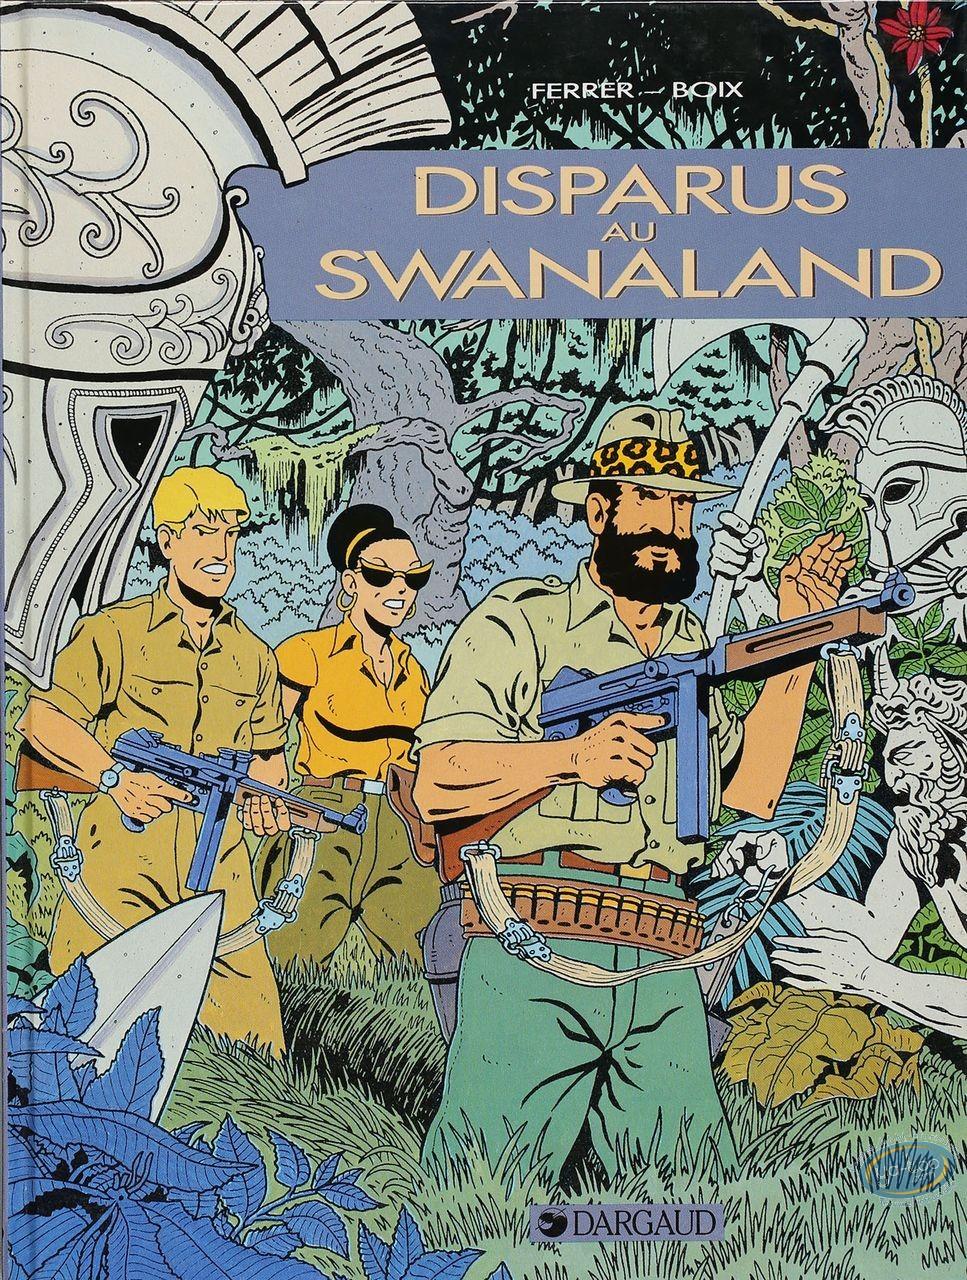 BD occasion, Disparus au Swanaland